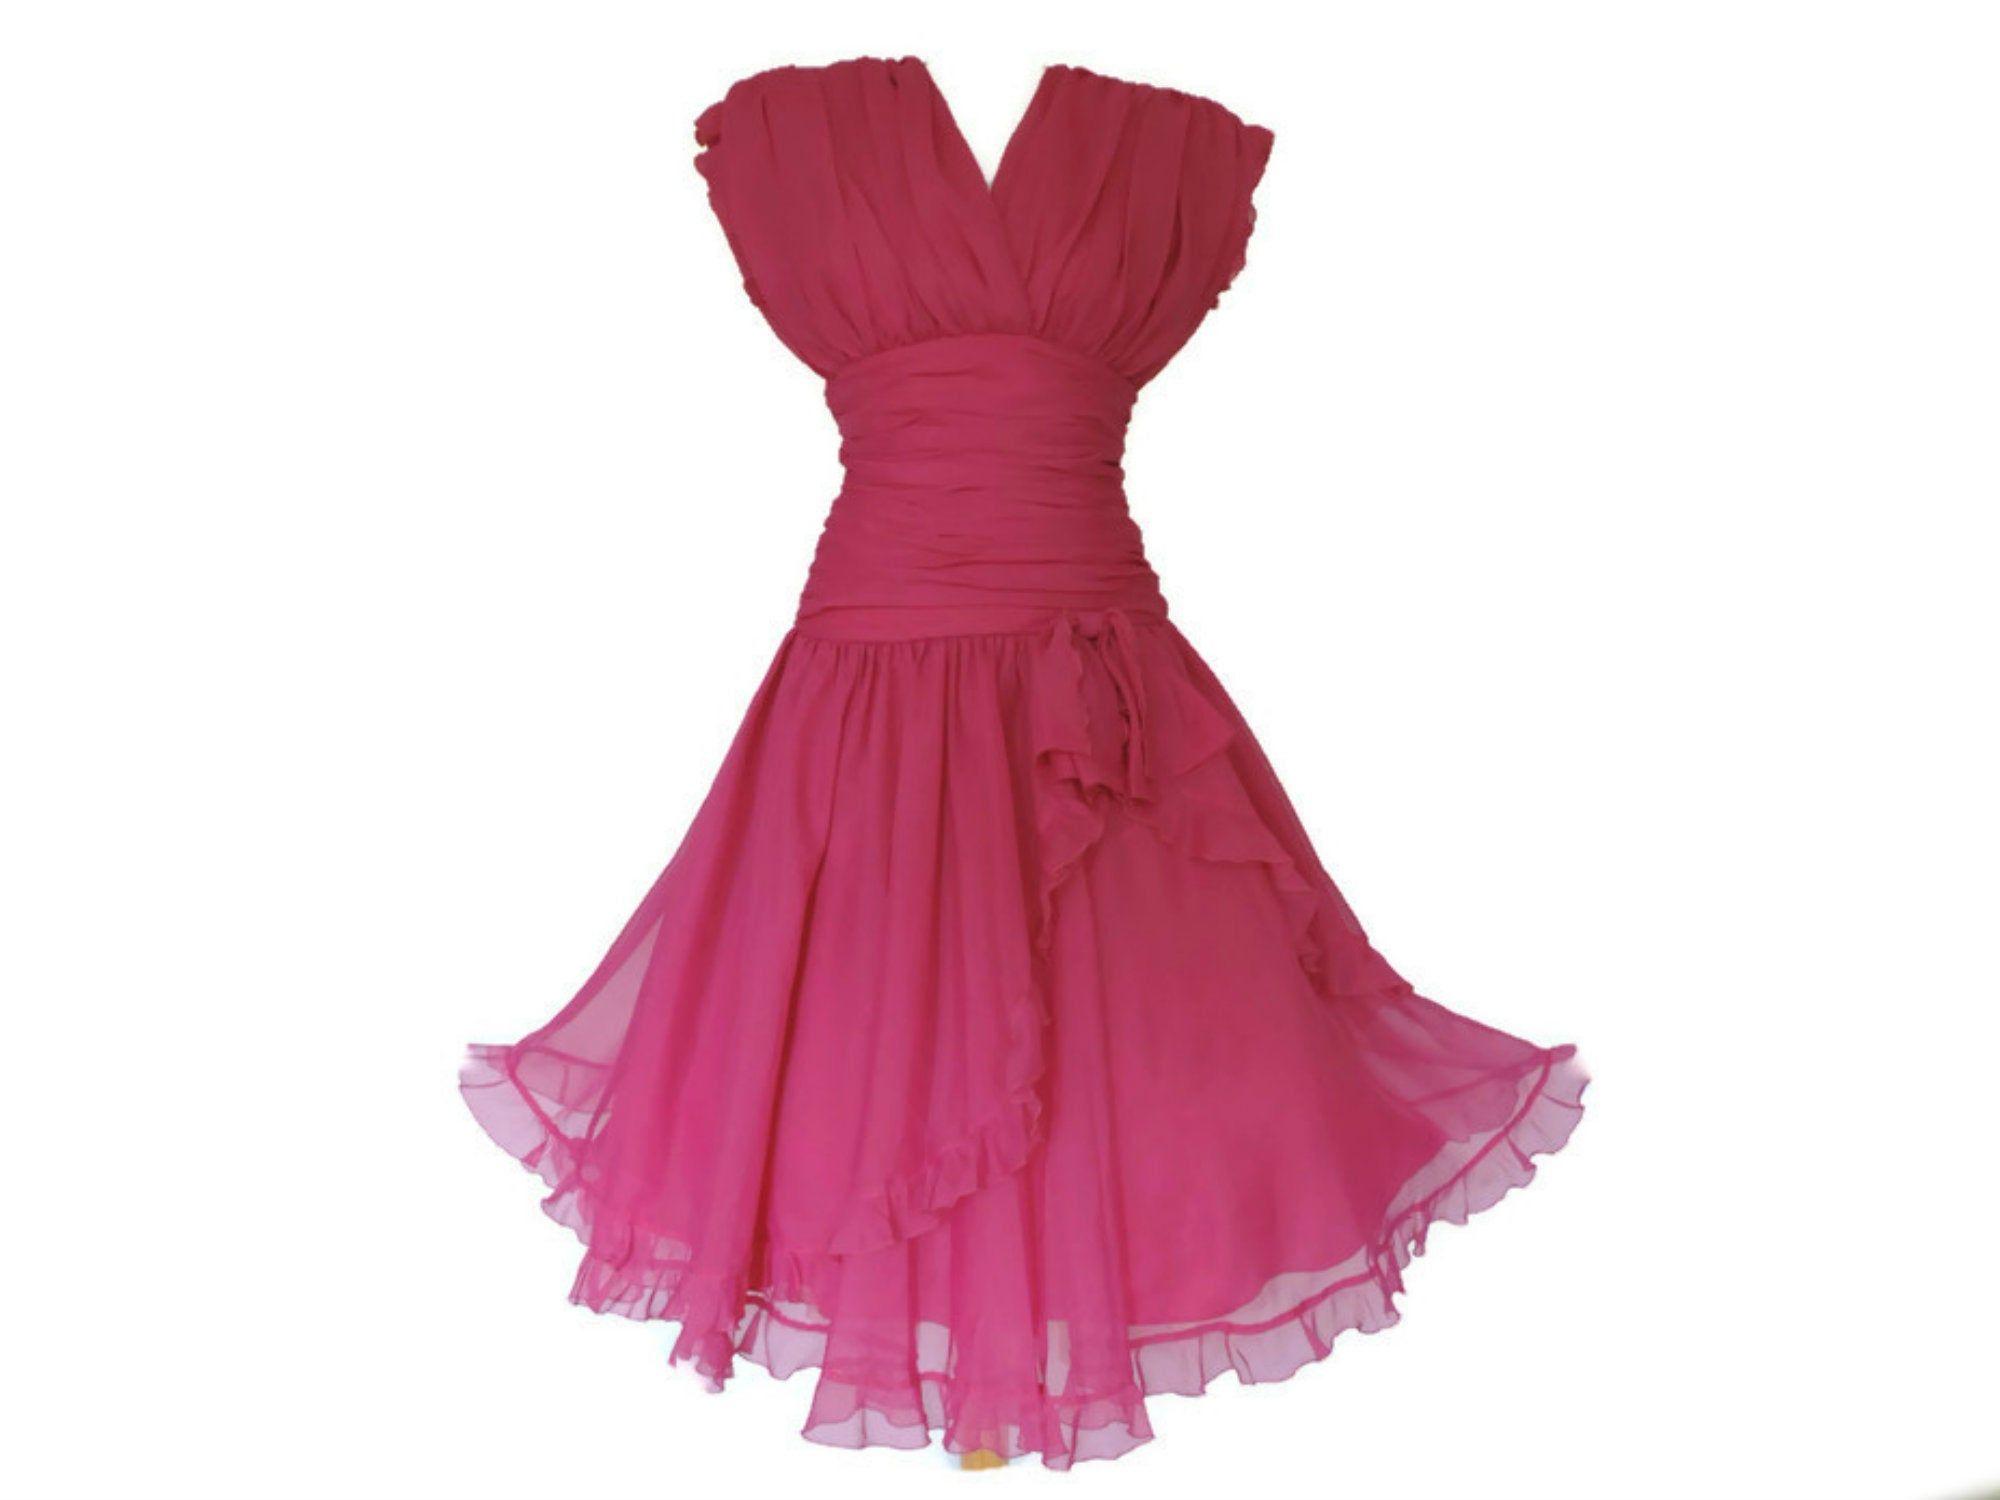 80s Pink Chiffon Frank Usher Cocktail Dress 80s Does 50s Uk 8 Us 4 Chiffon Cocktail Dress Pink Chiffon Cocktail Dress Cocktail Dress [ 1500 x 2000 Pixel ]